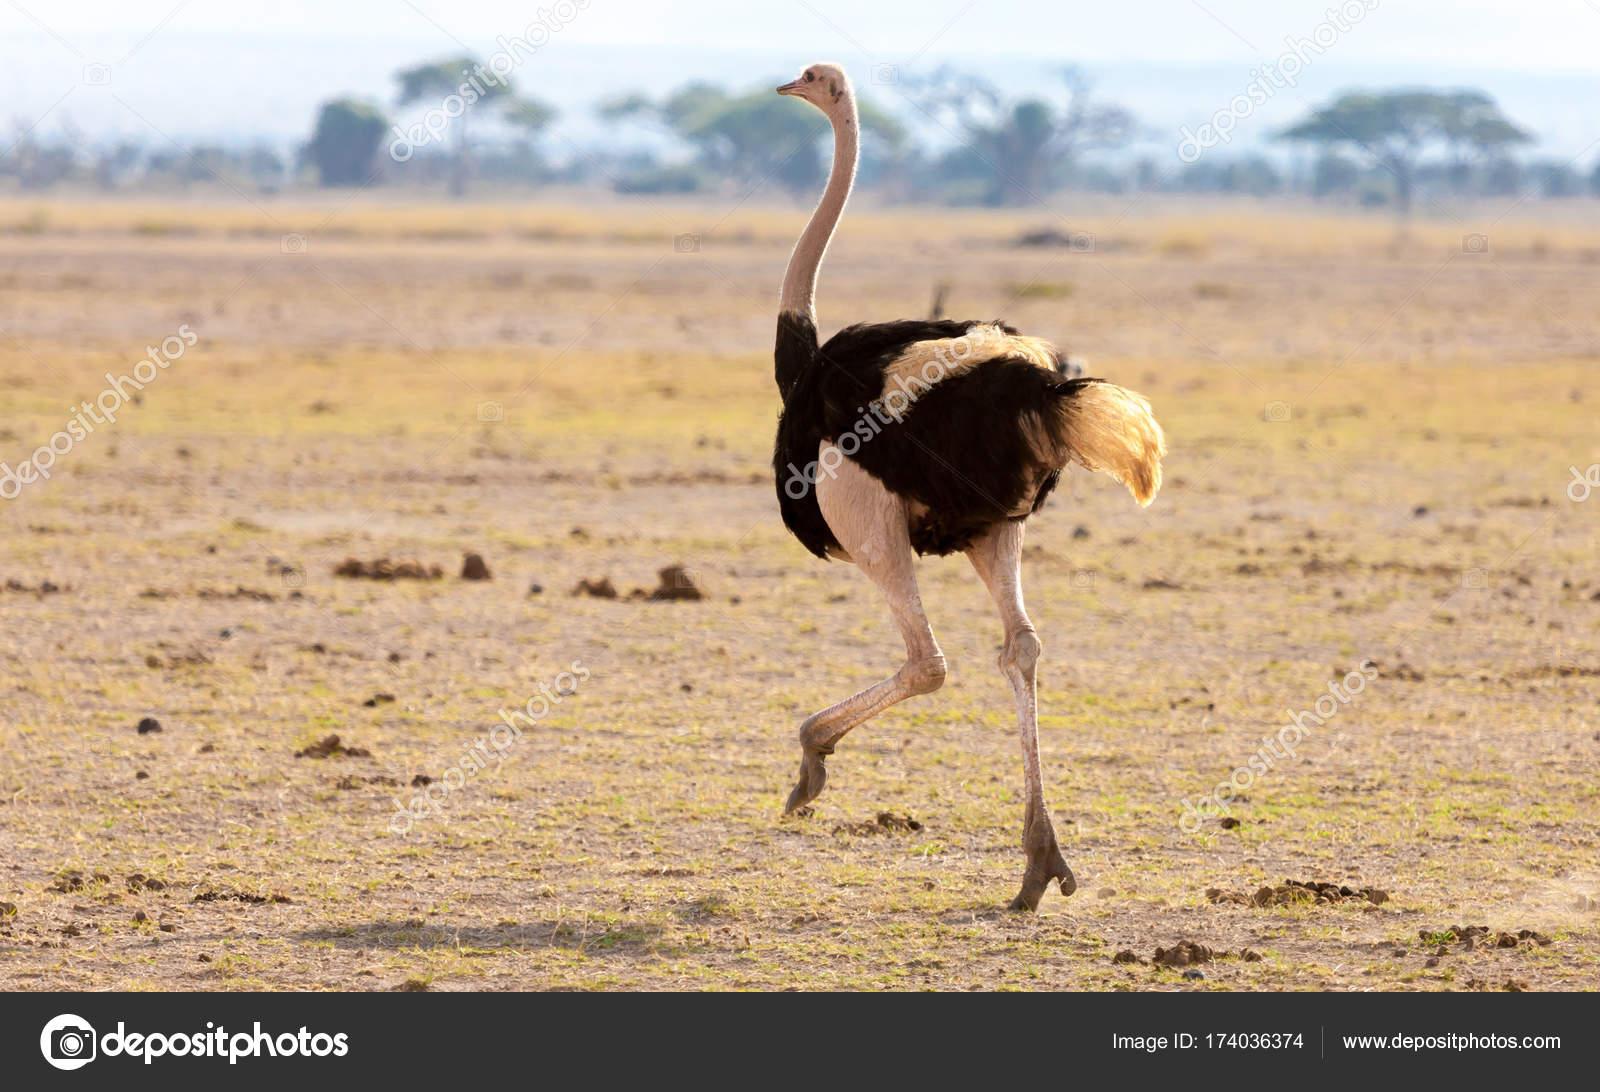 Ein Strauß Läuft Auf Safari In Kenia Stockfoto 25ehaag6 174036374